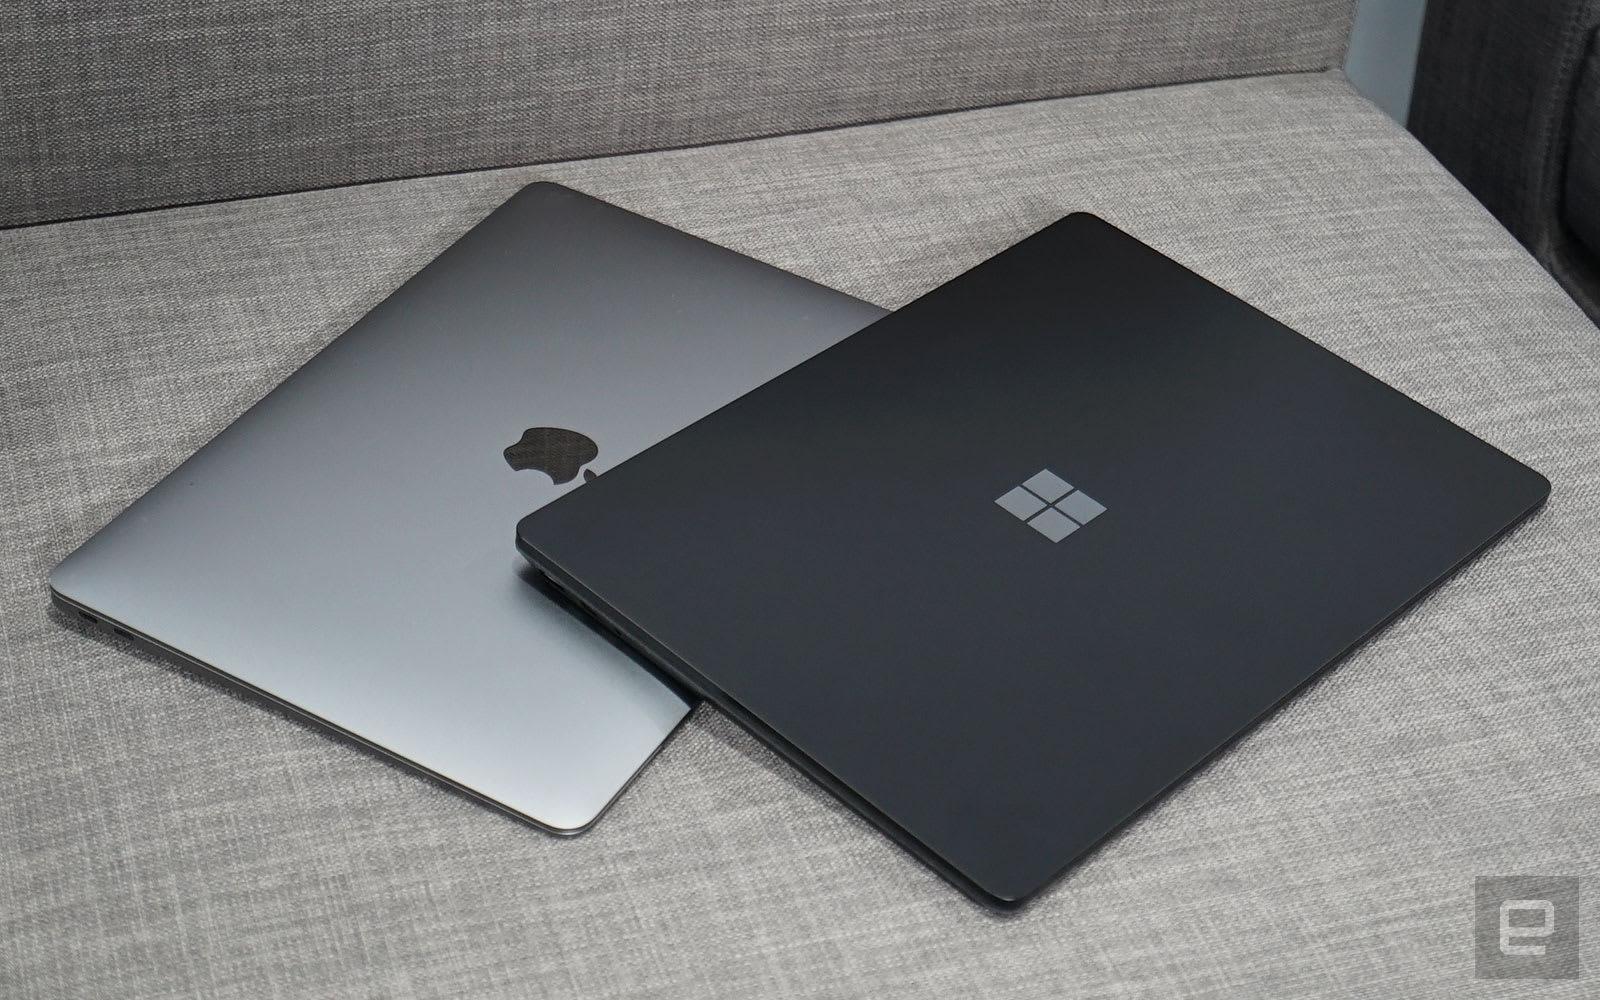 Surface Laptop 2 MacBook Air